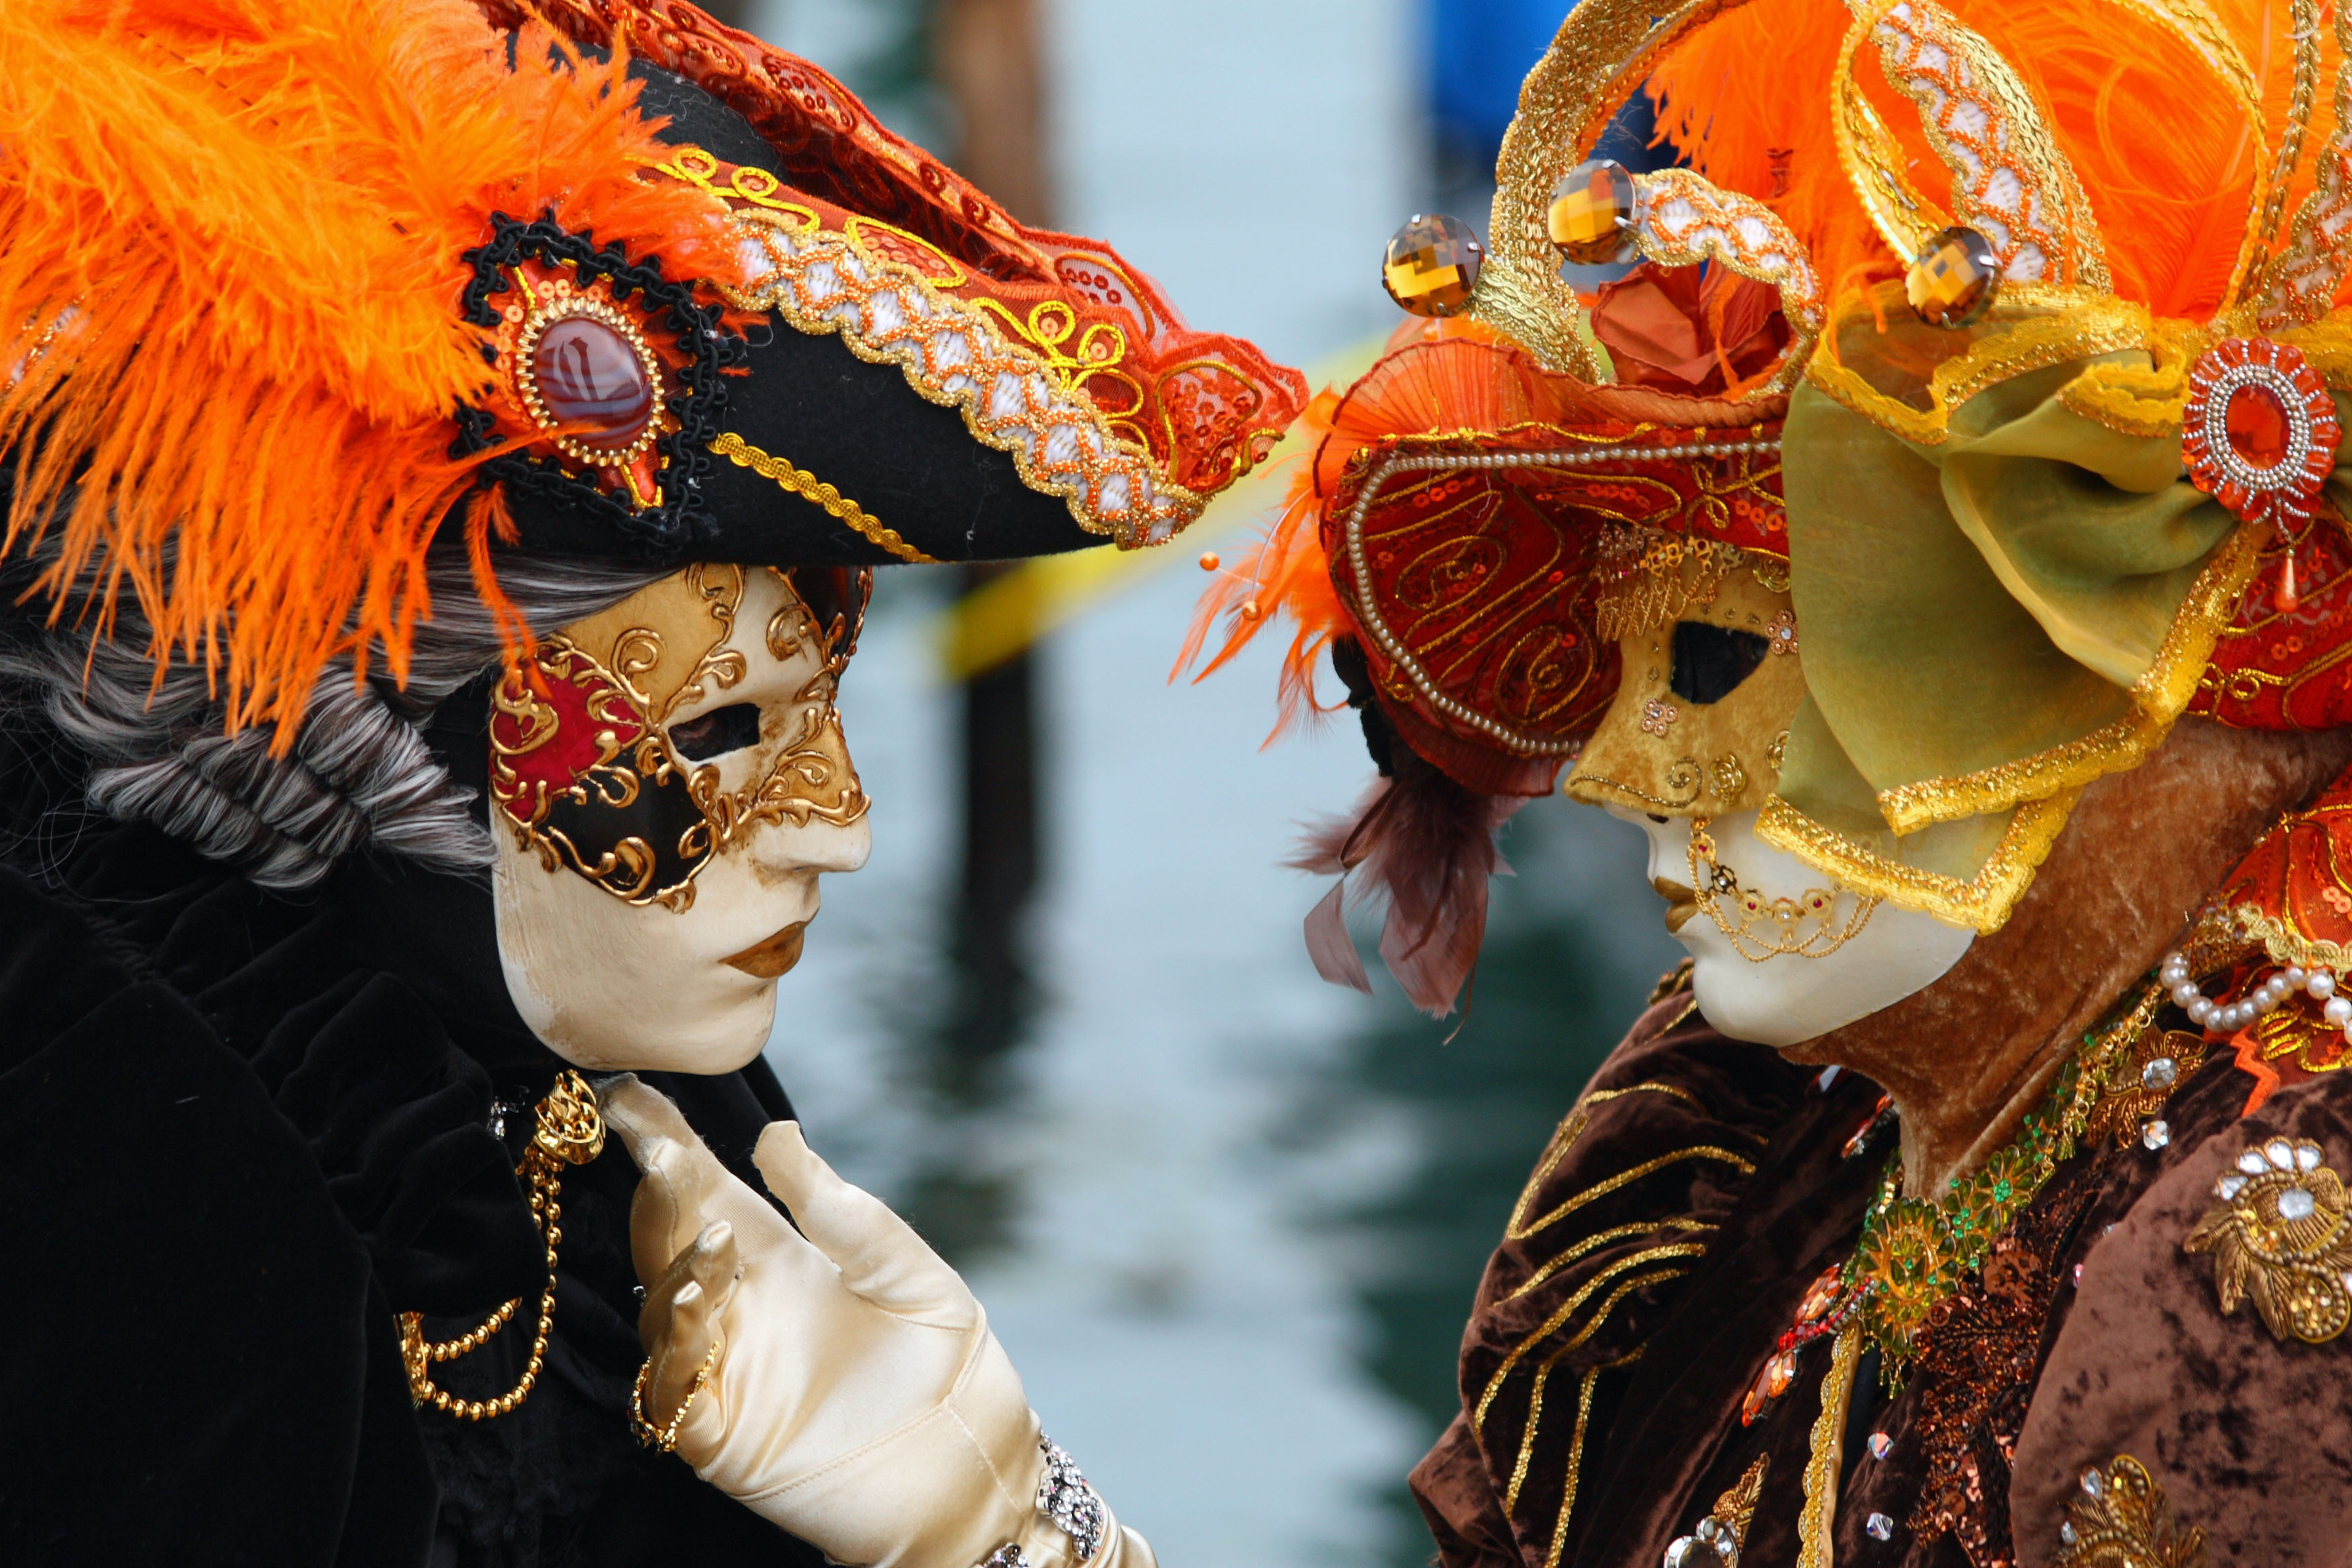 http://upload.wikimedia.org/wikipedia/commons/c/ca/Venice_Carnival_-_Masked_Lovers_(2010).jpg